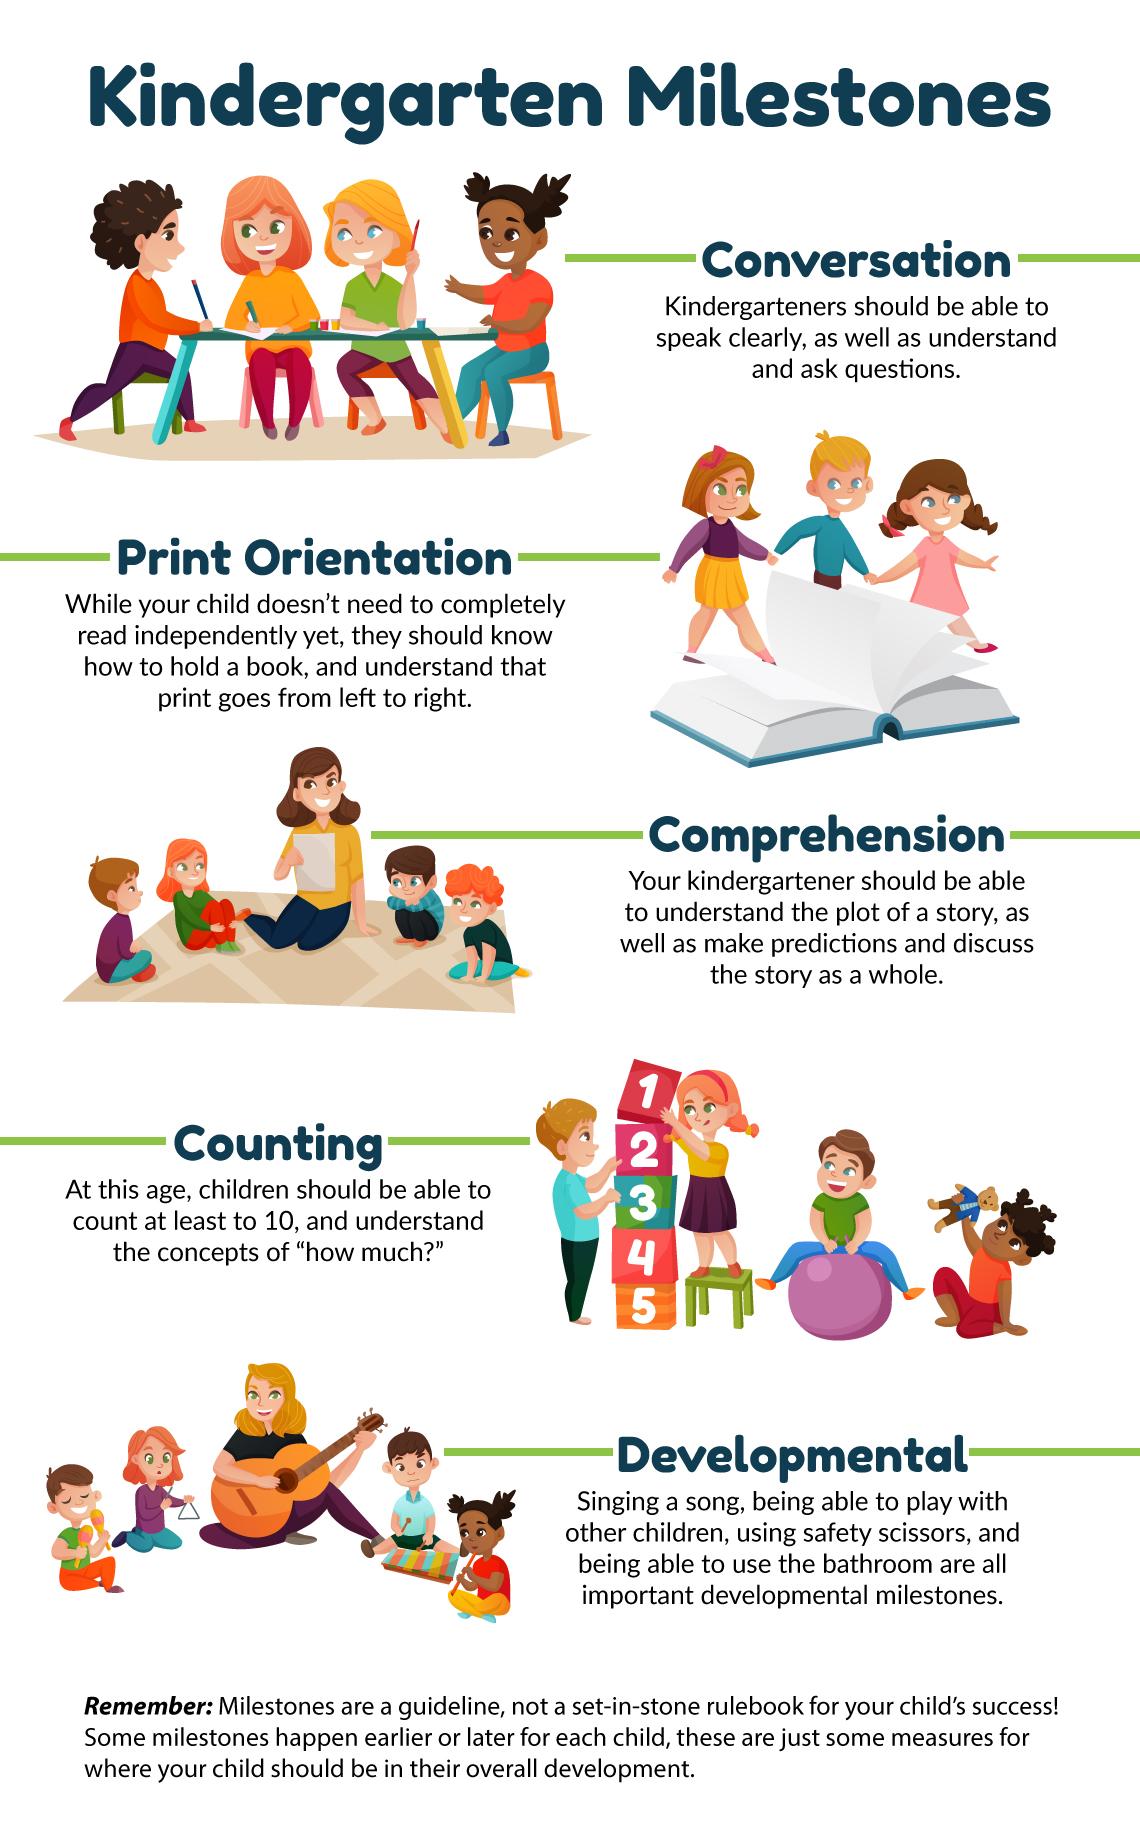 Many Kids Not Ready For Kindergarten >> Preschool Salt Lake City Is My Child Ready For Kindergarten